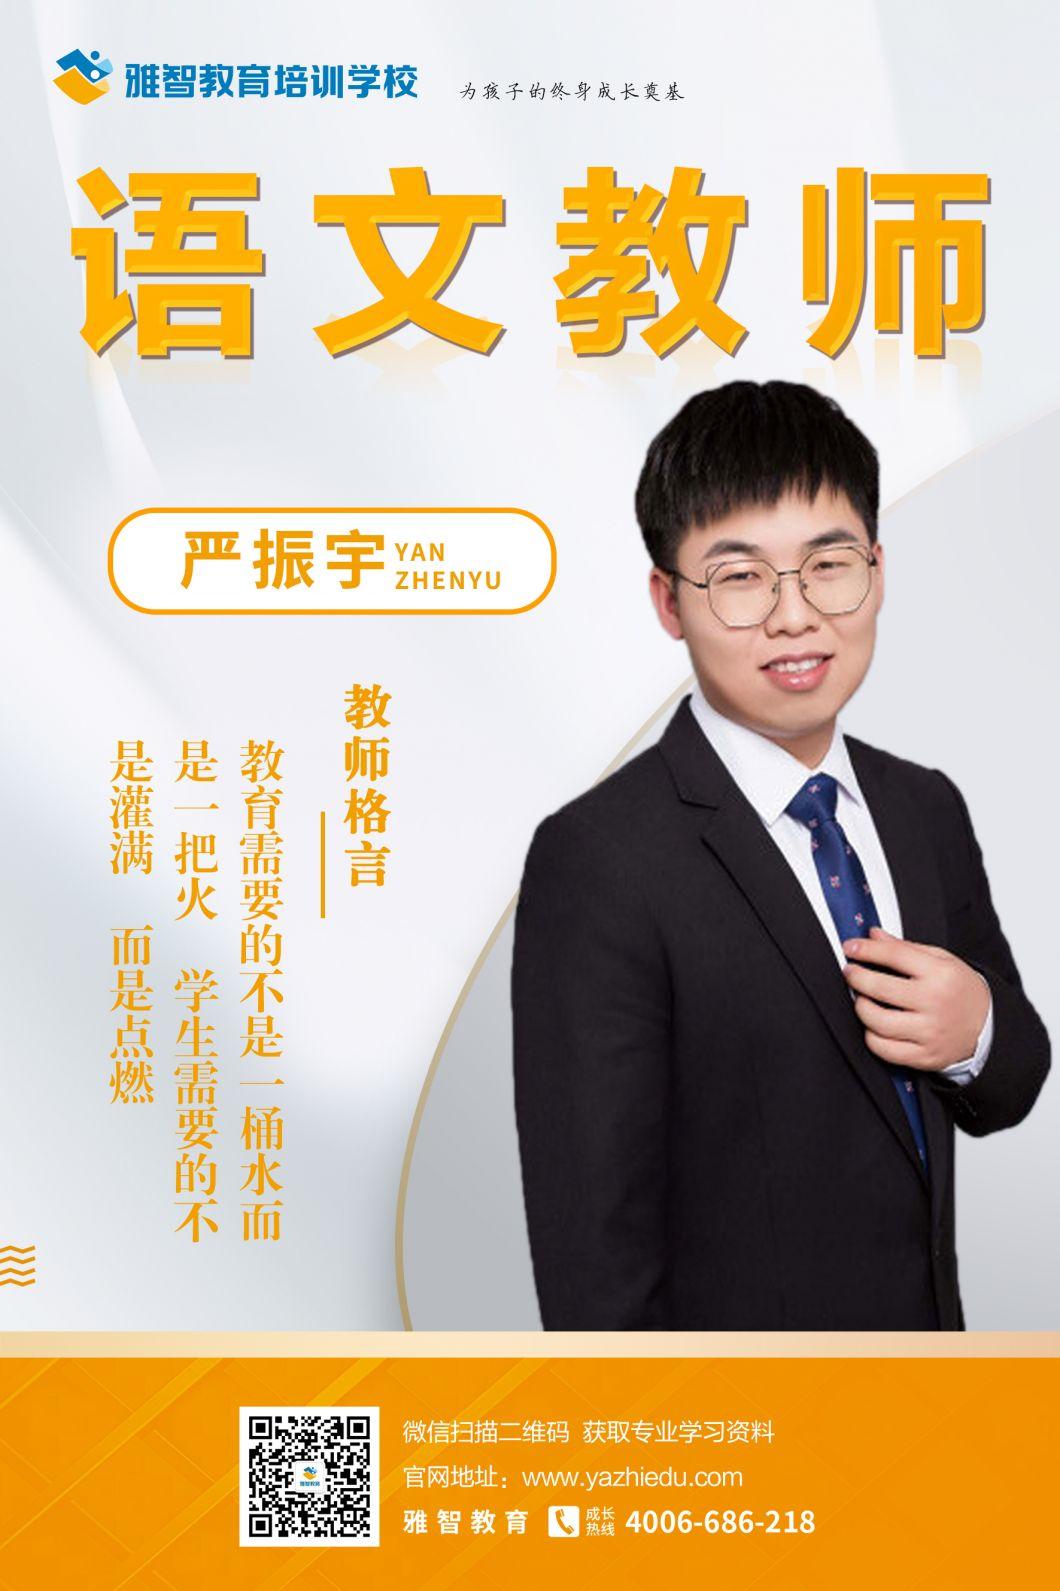 /uploads/image/2021/06/04/严振宇.jpg